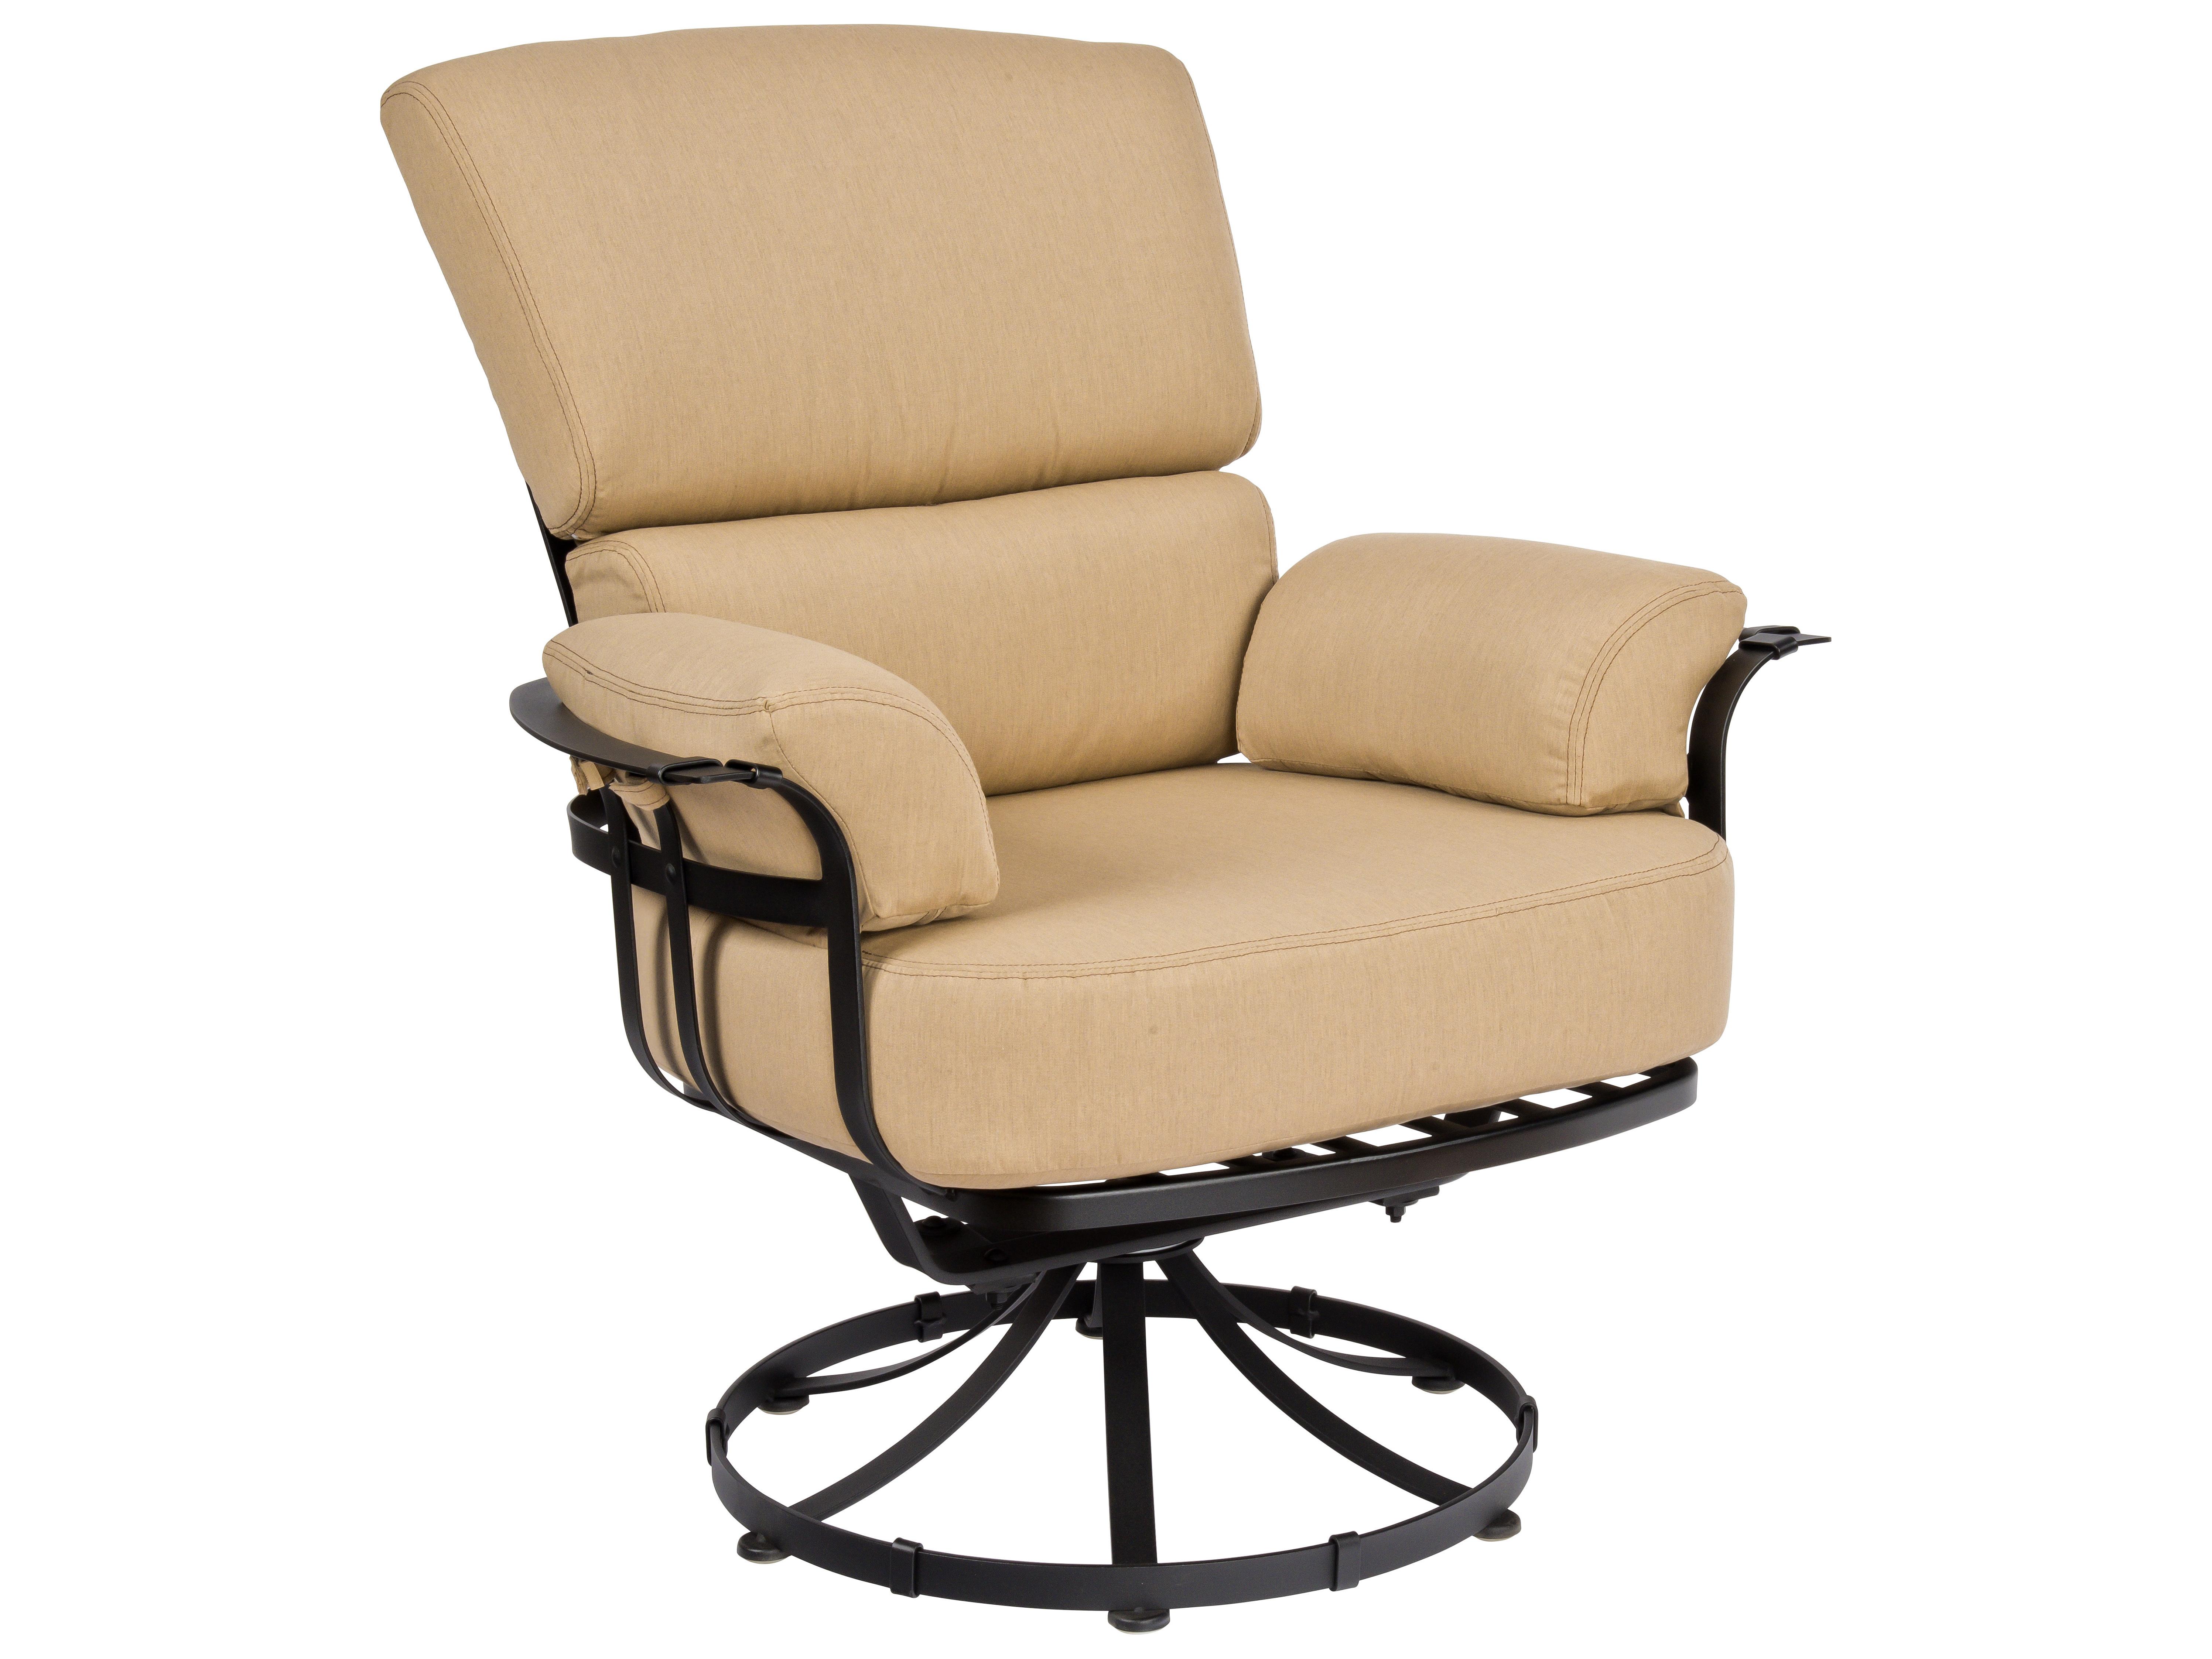 Woodard Atlas Swivel Lounge Chair Replacement Cushions ...